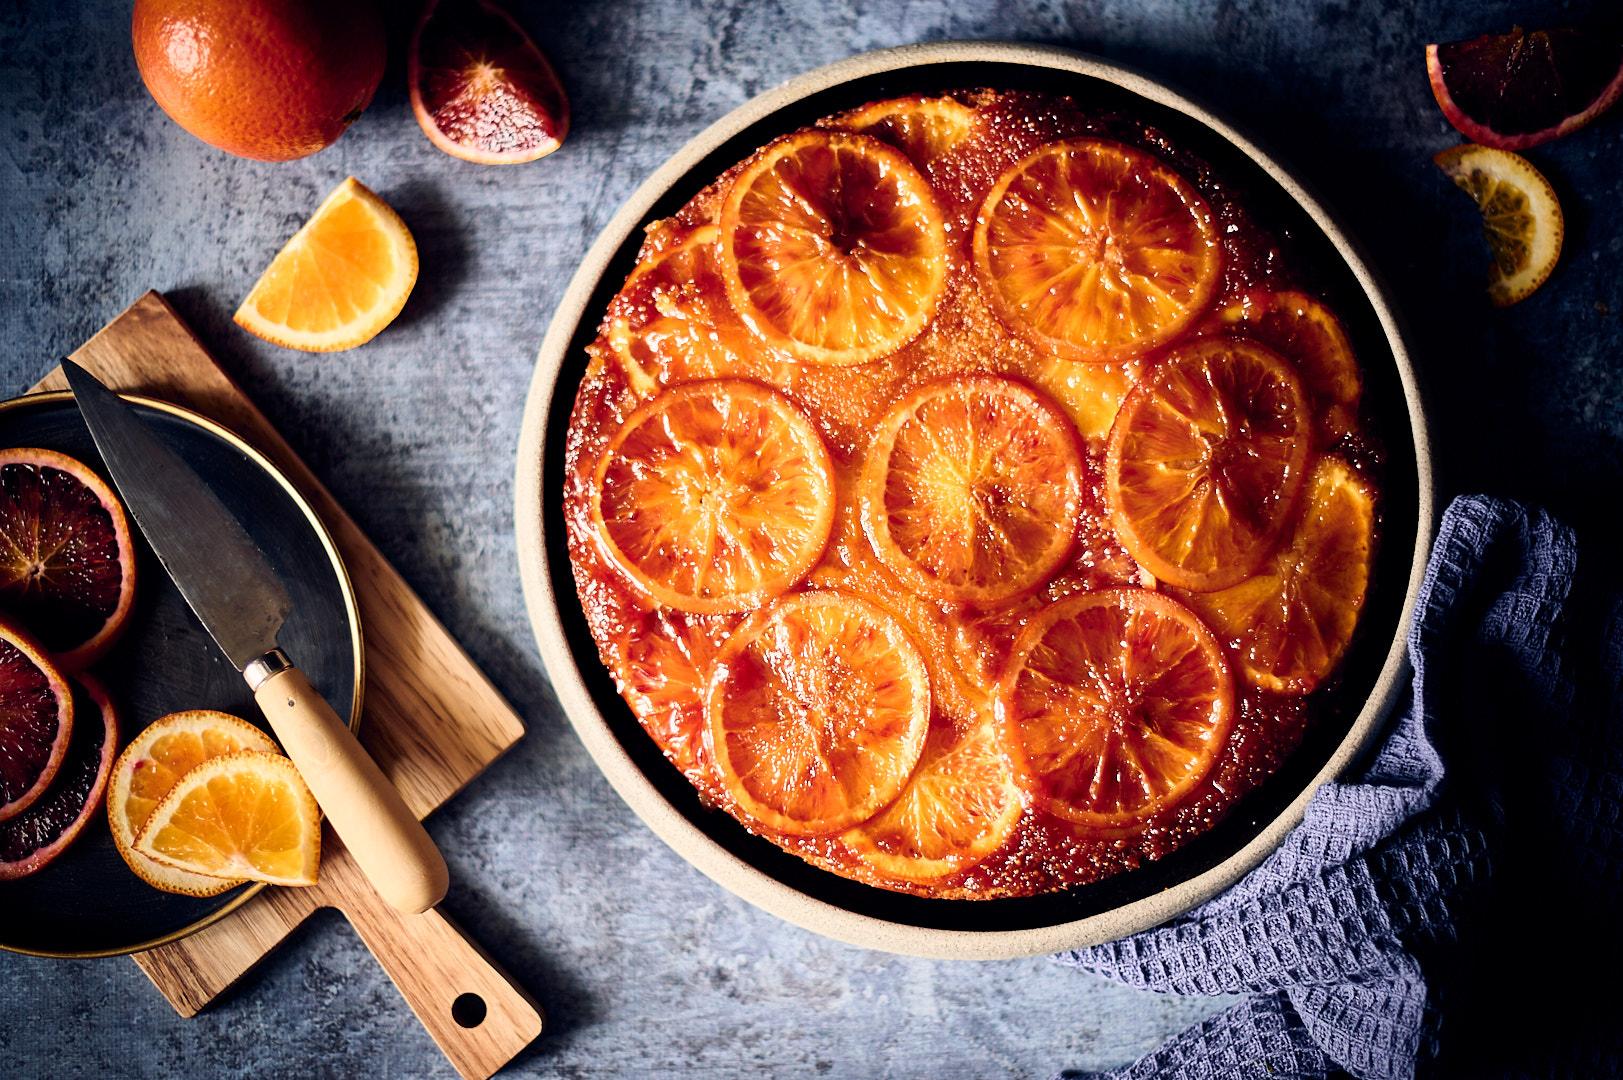 Gâteau renversé à l'orange sanguine